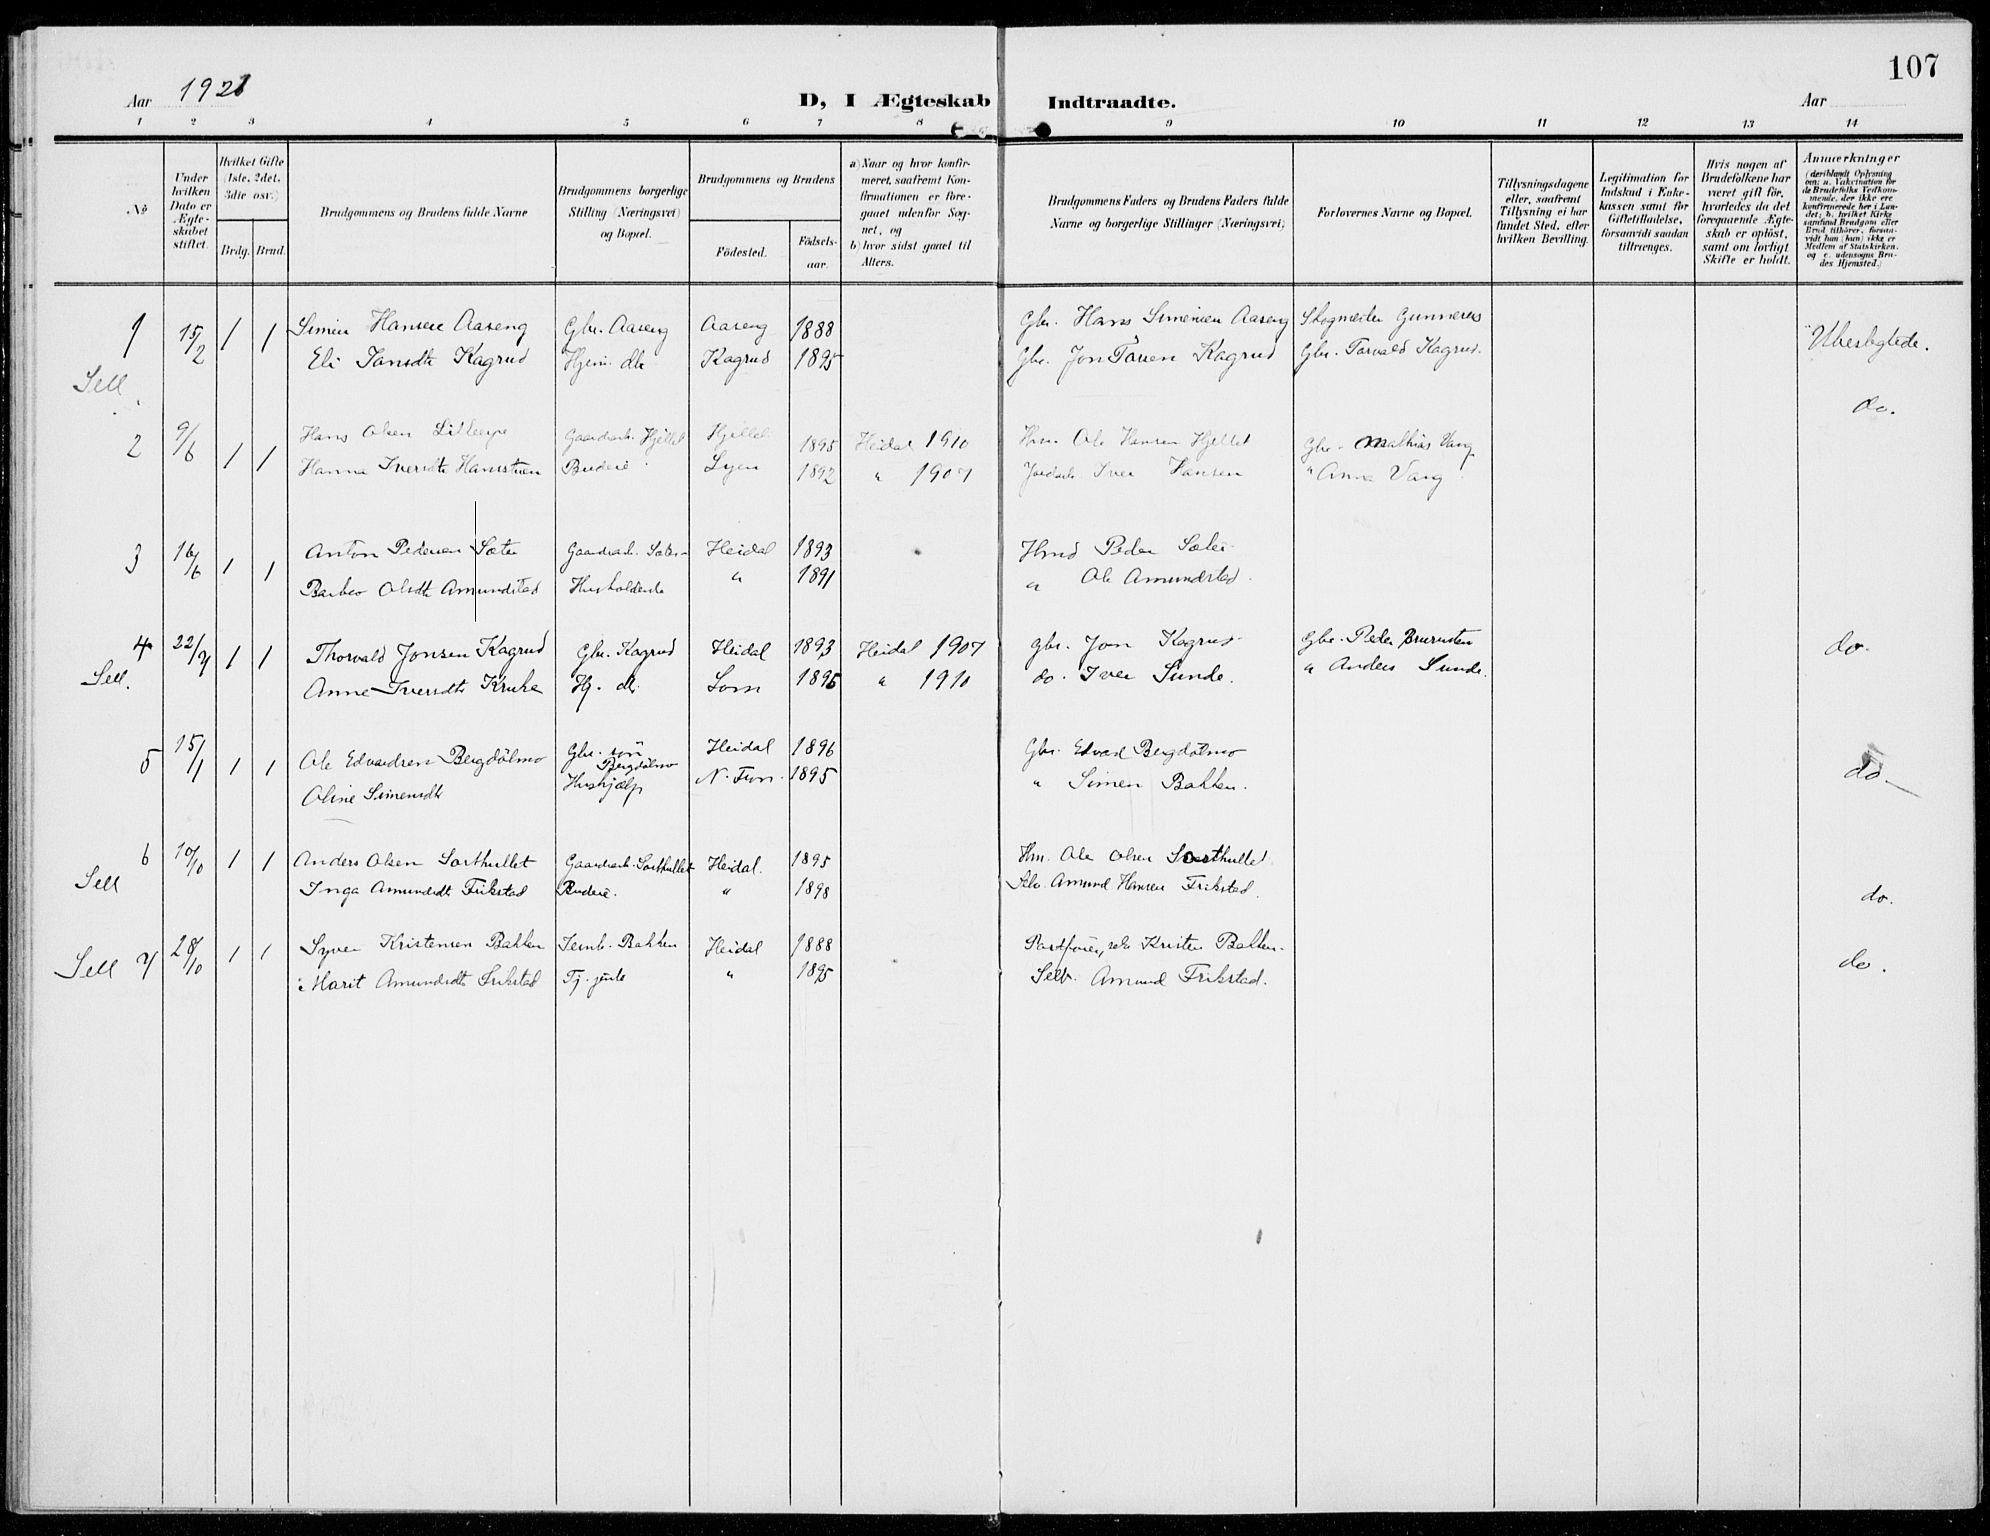 SAH, Sel prestekontor, Ministerialbok nr. 1, 1905-1922, s. 107